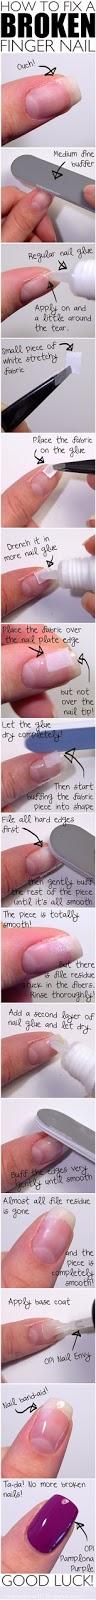 DIY Nails tutorial, DIY Nails, Nails tutorial